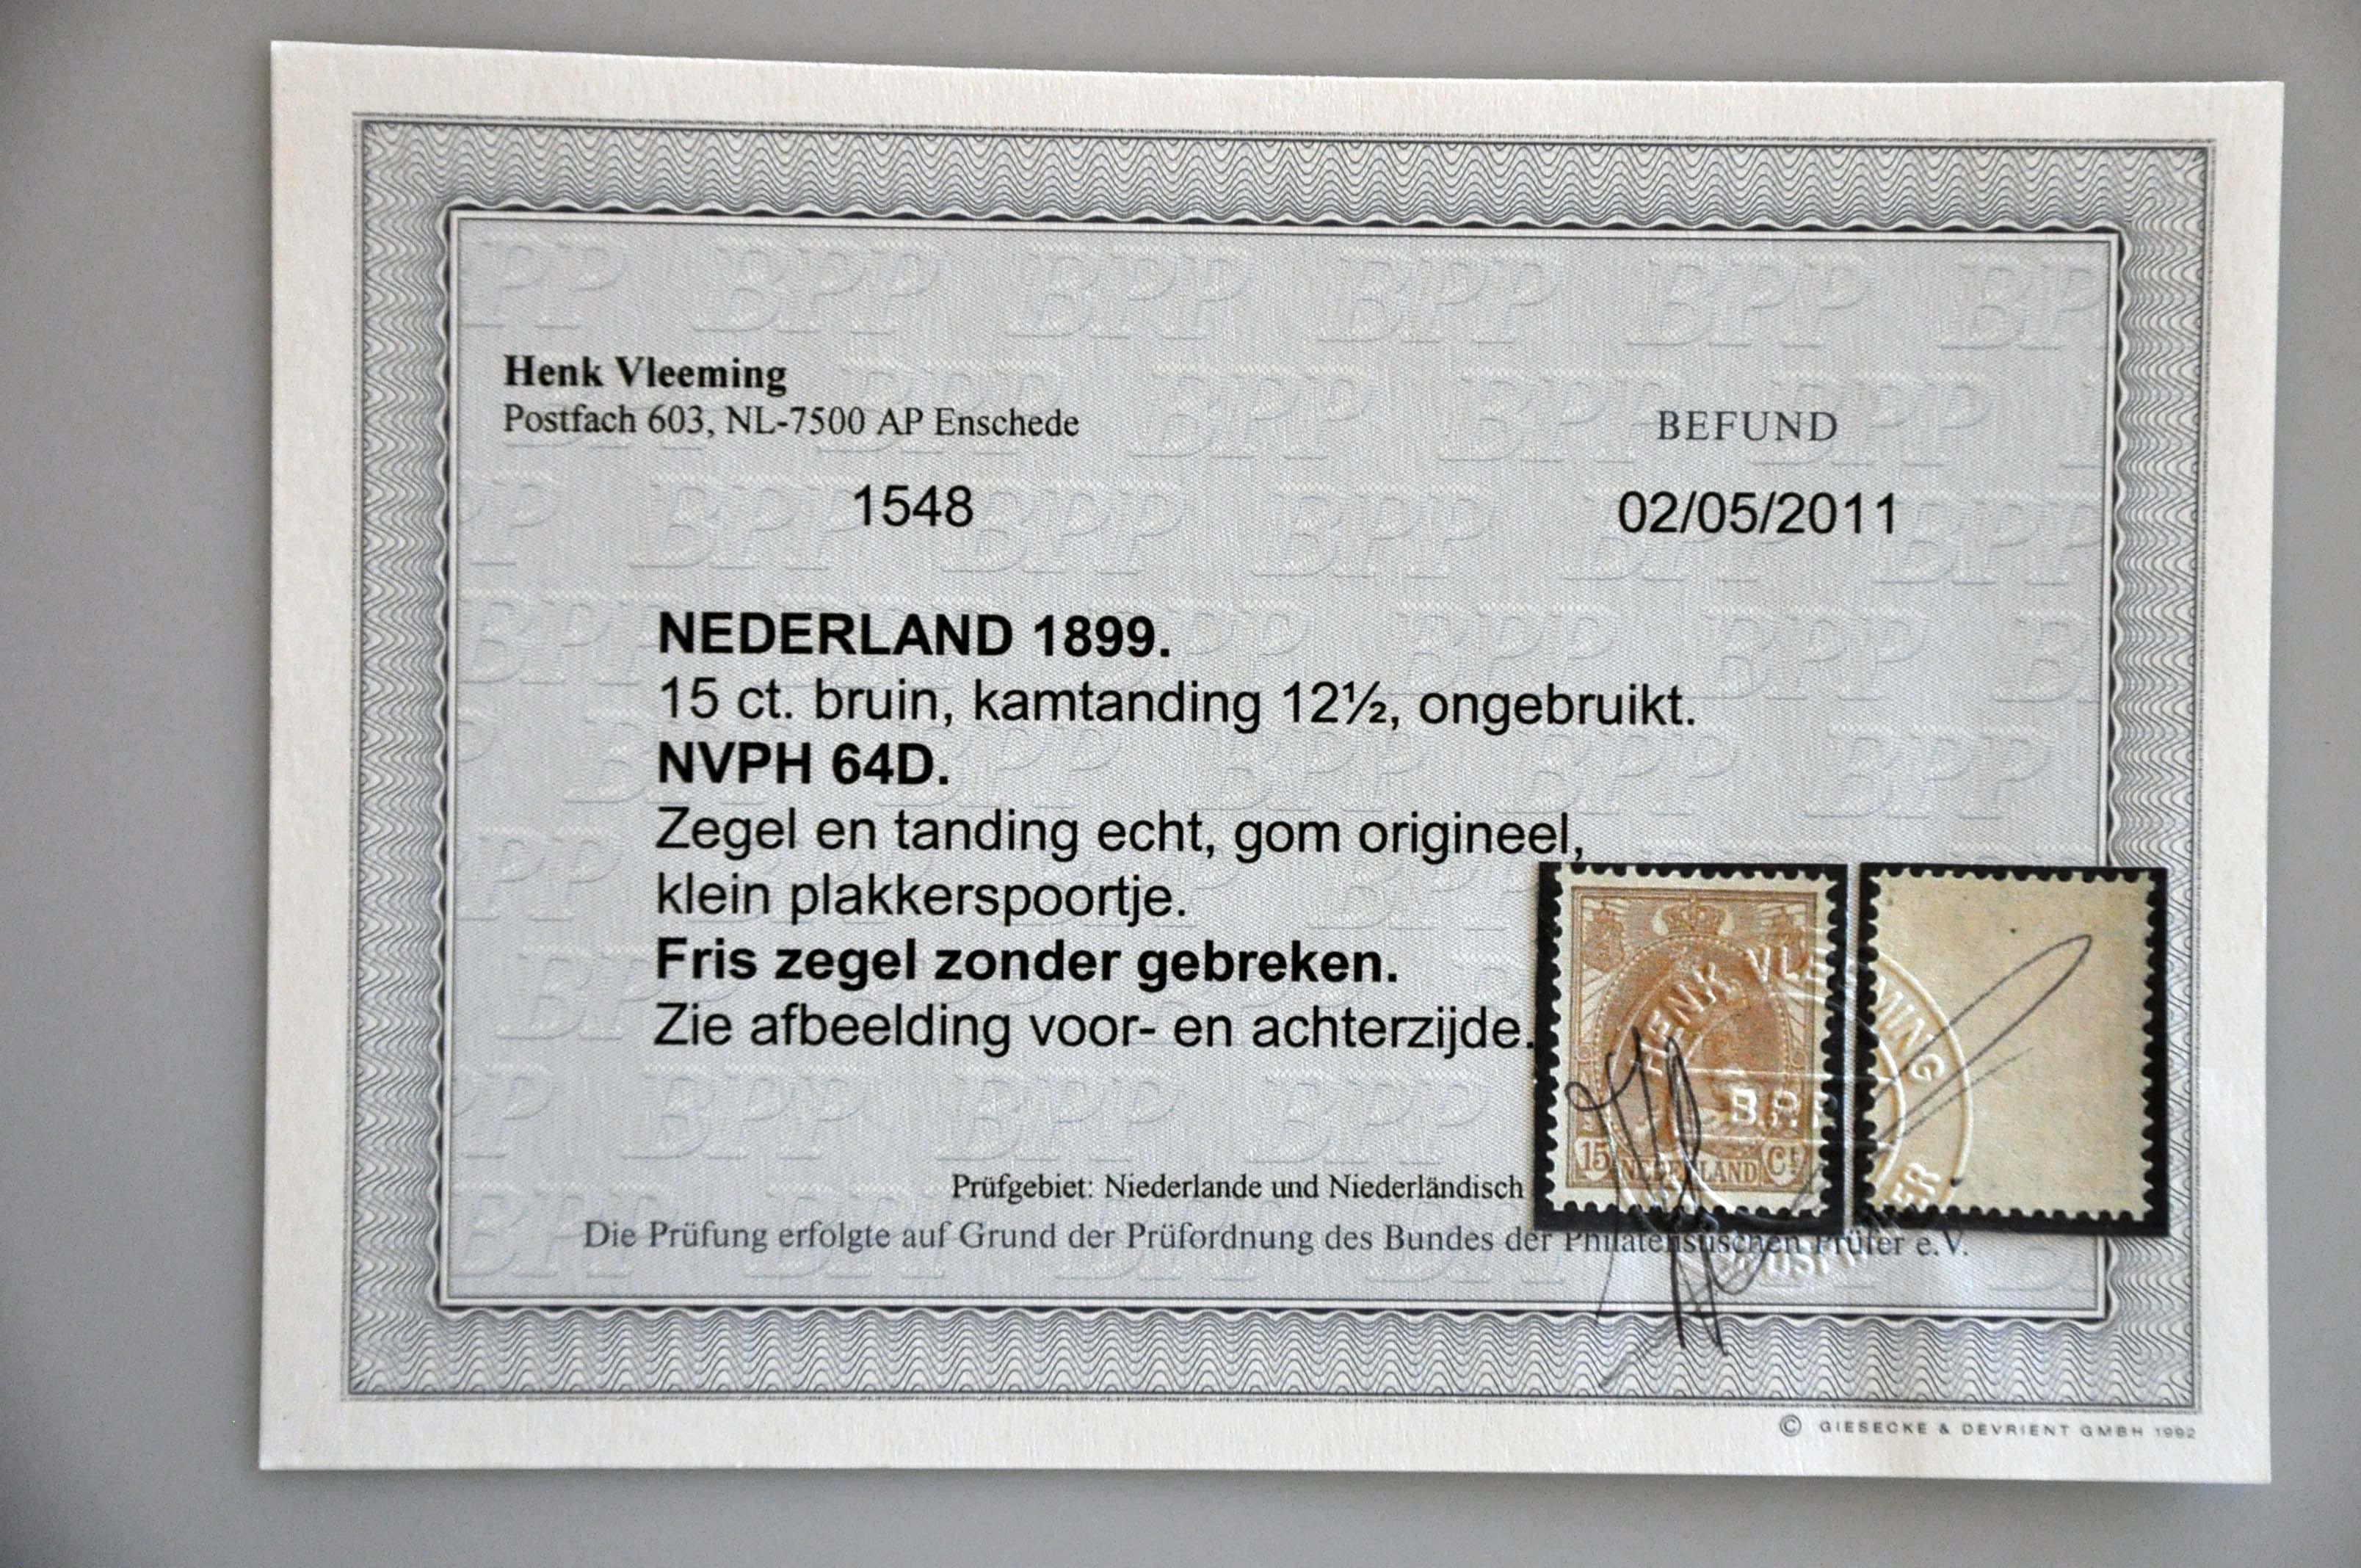 Lot 1470 - Netherlands and former colonies Netherlands -  Corinphila Veilingen Auction 239: General sale